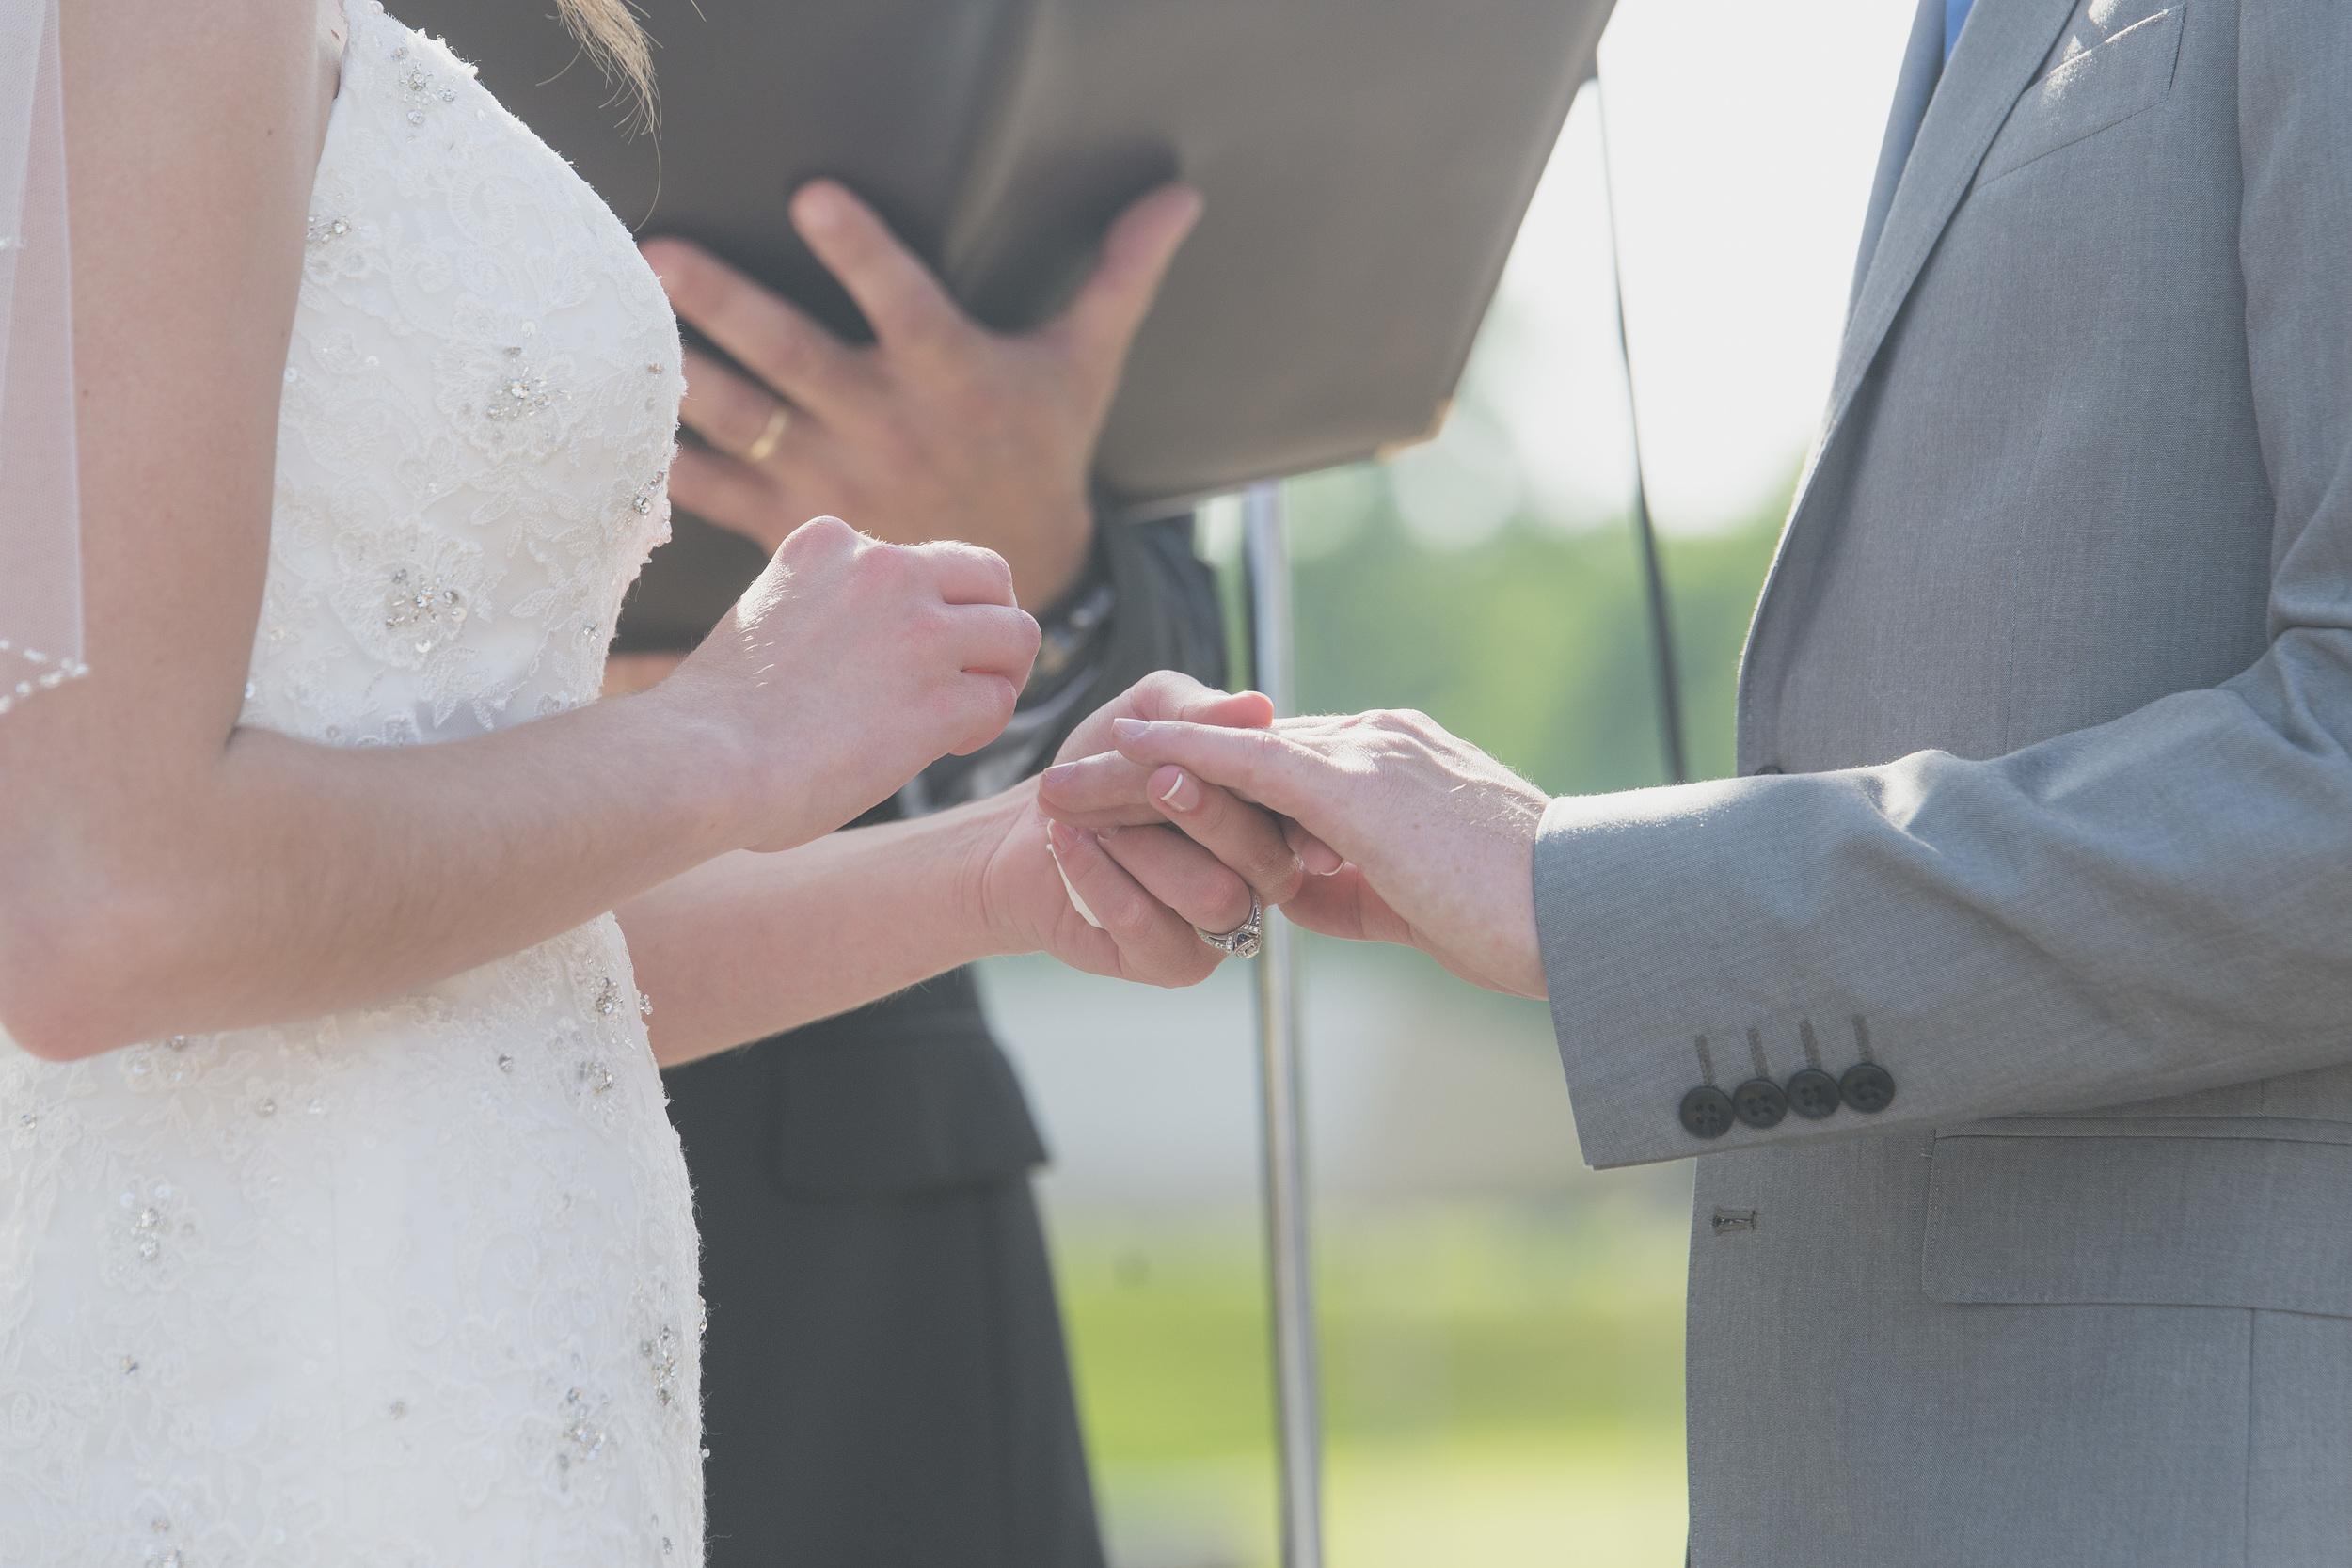 New_jersey_blue_heron_pines_wedding20150529_0560.jpg